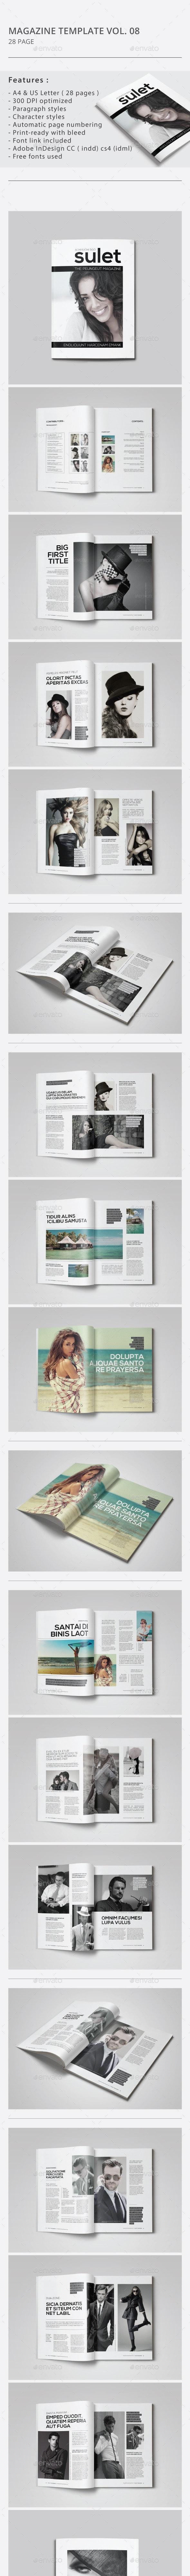 Indesign Magazine Template Vol.08 - Magazines Print Templates